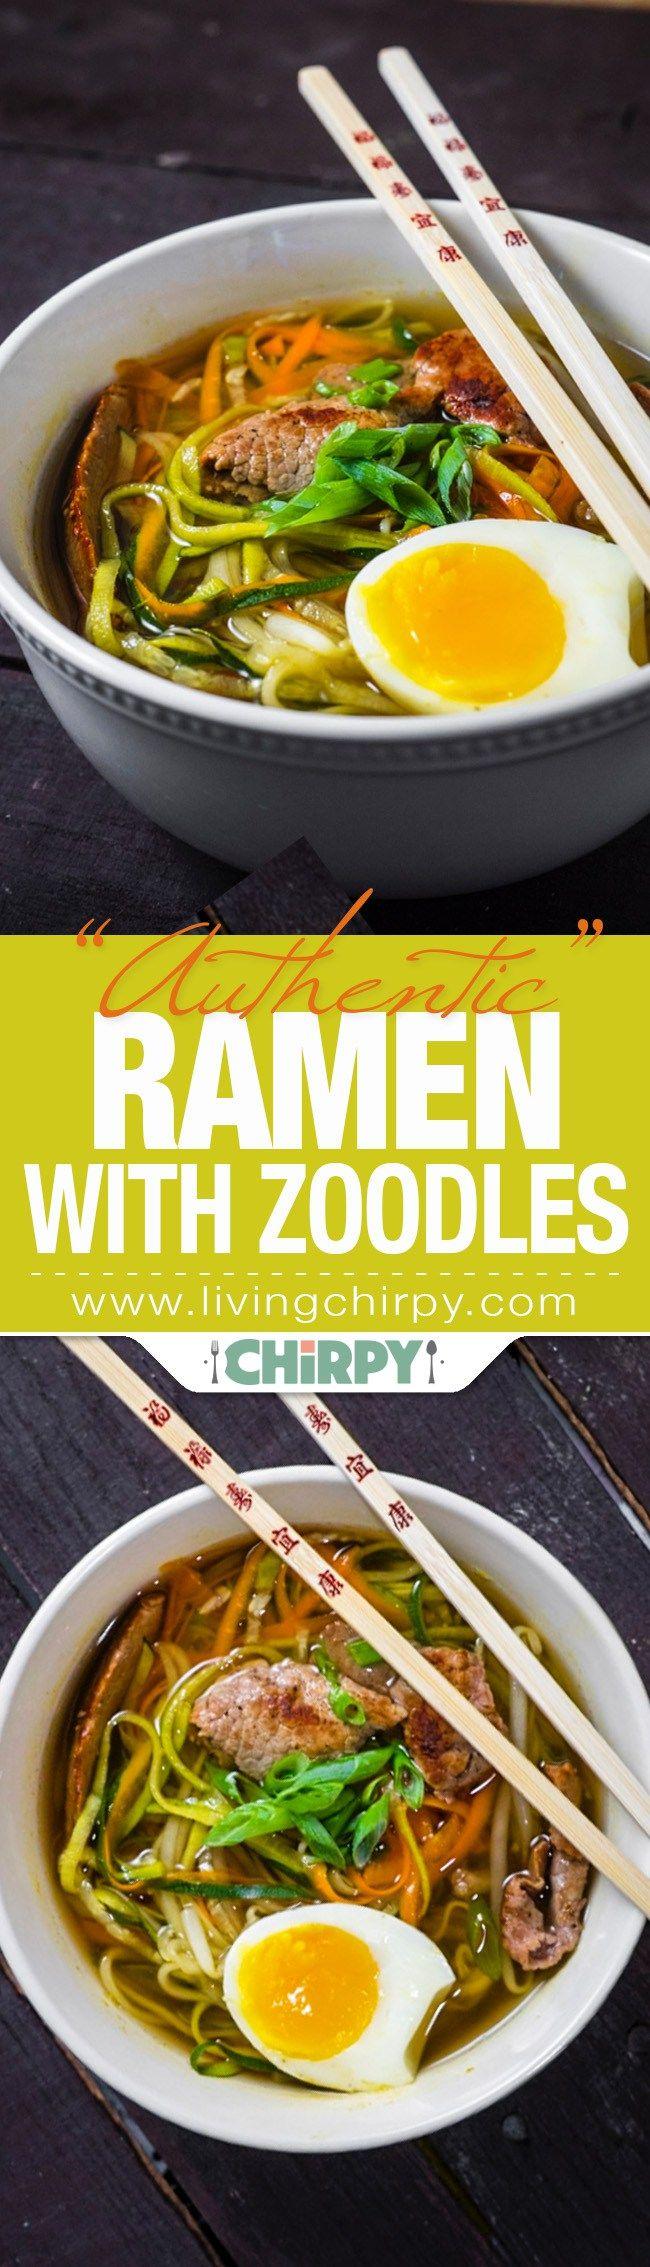 1000+ ideas about Healthy Ramen on Pinterest | Ramen ...